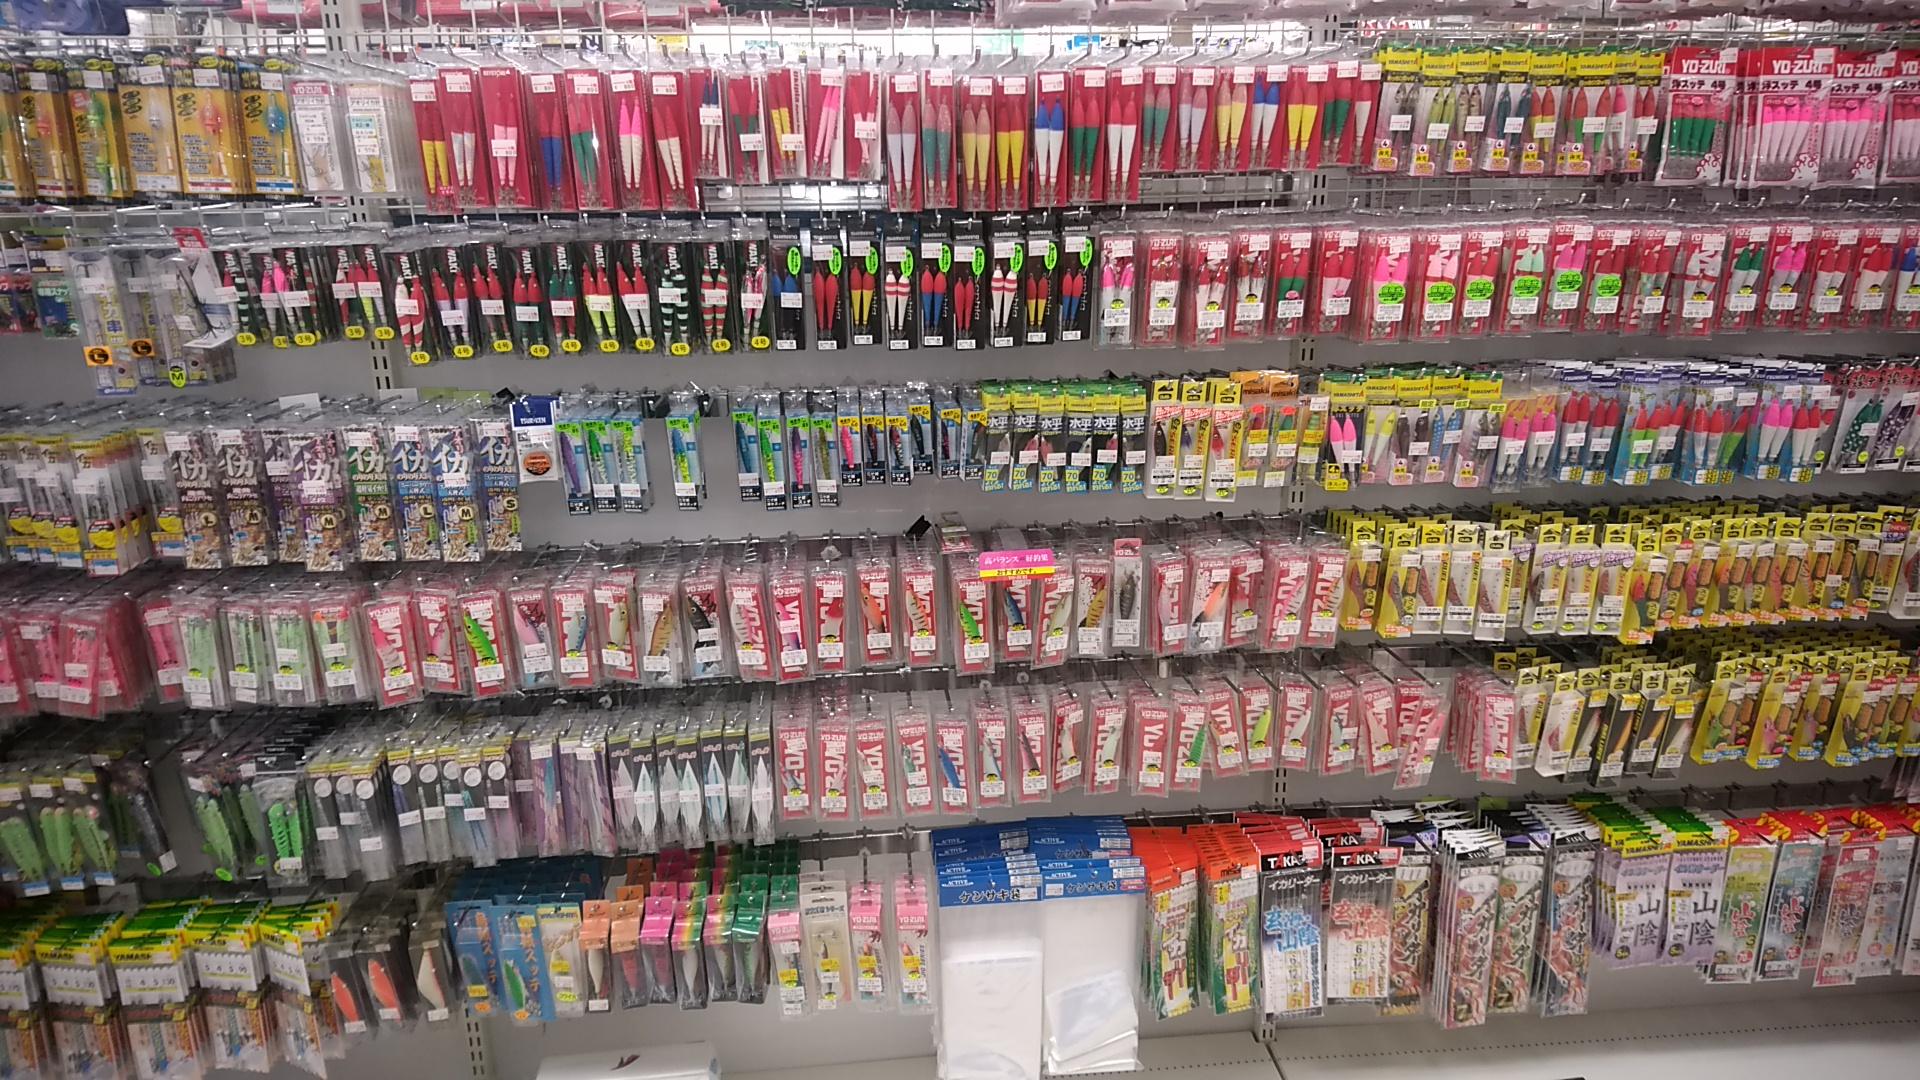 http://www.e-angle.co.jp/shop/news/yamaguchi3.jpg